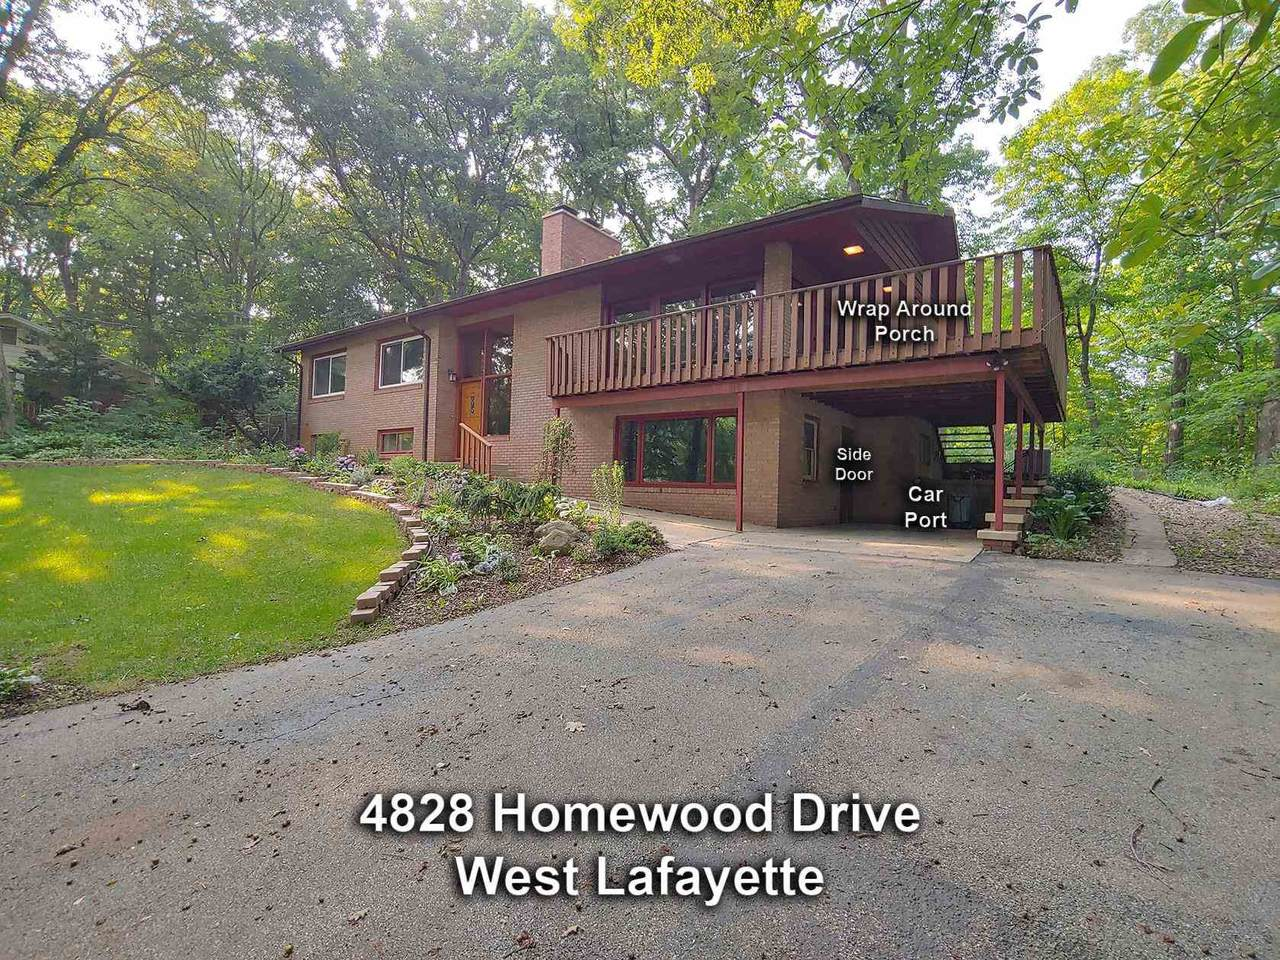 4828 Homewood Drive - Photo 1